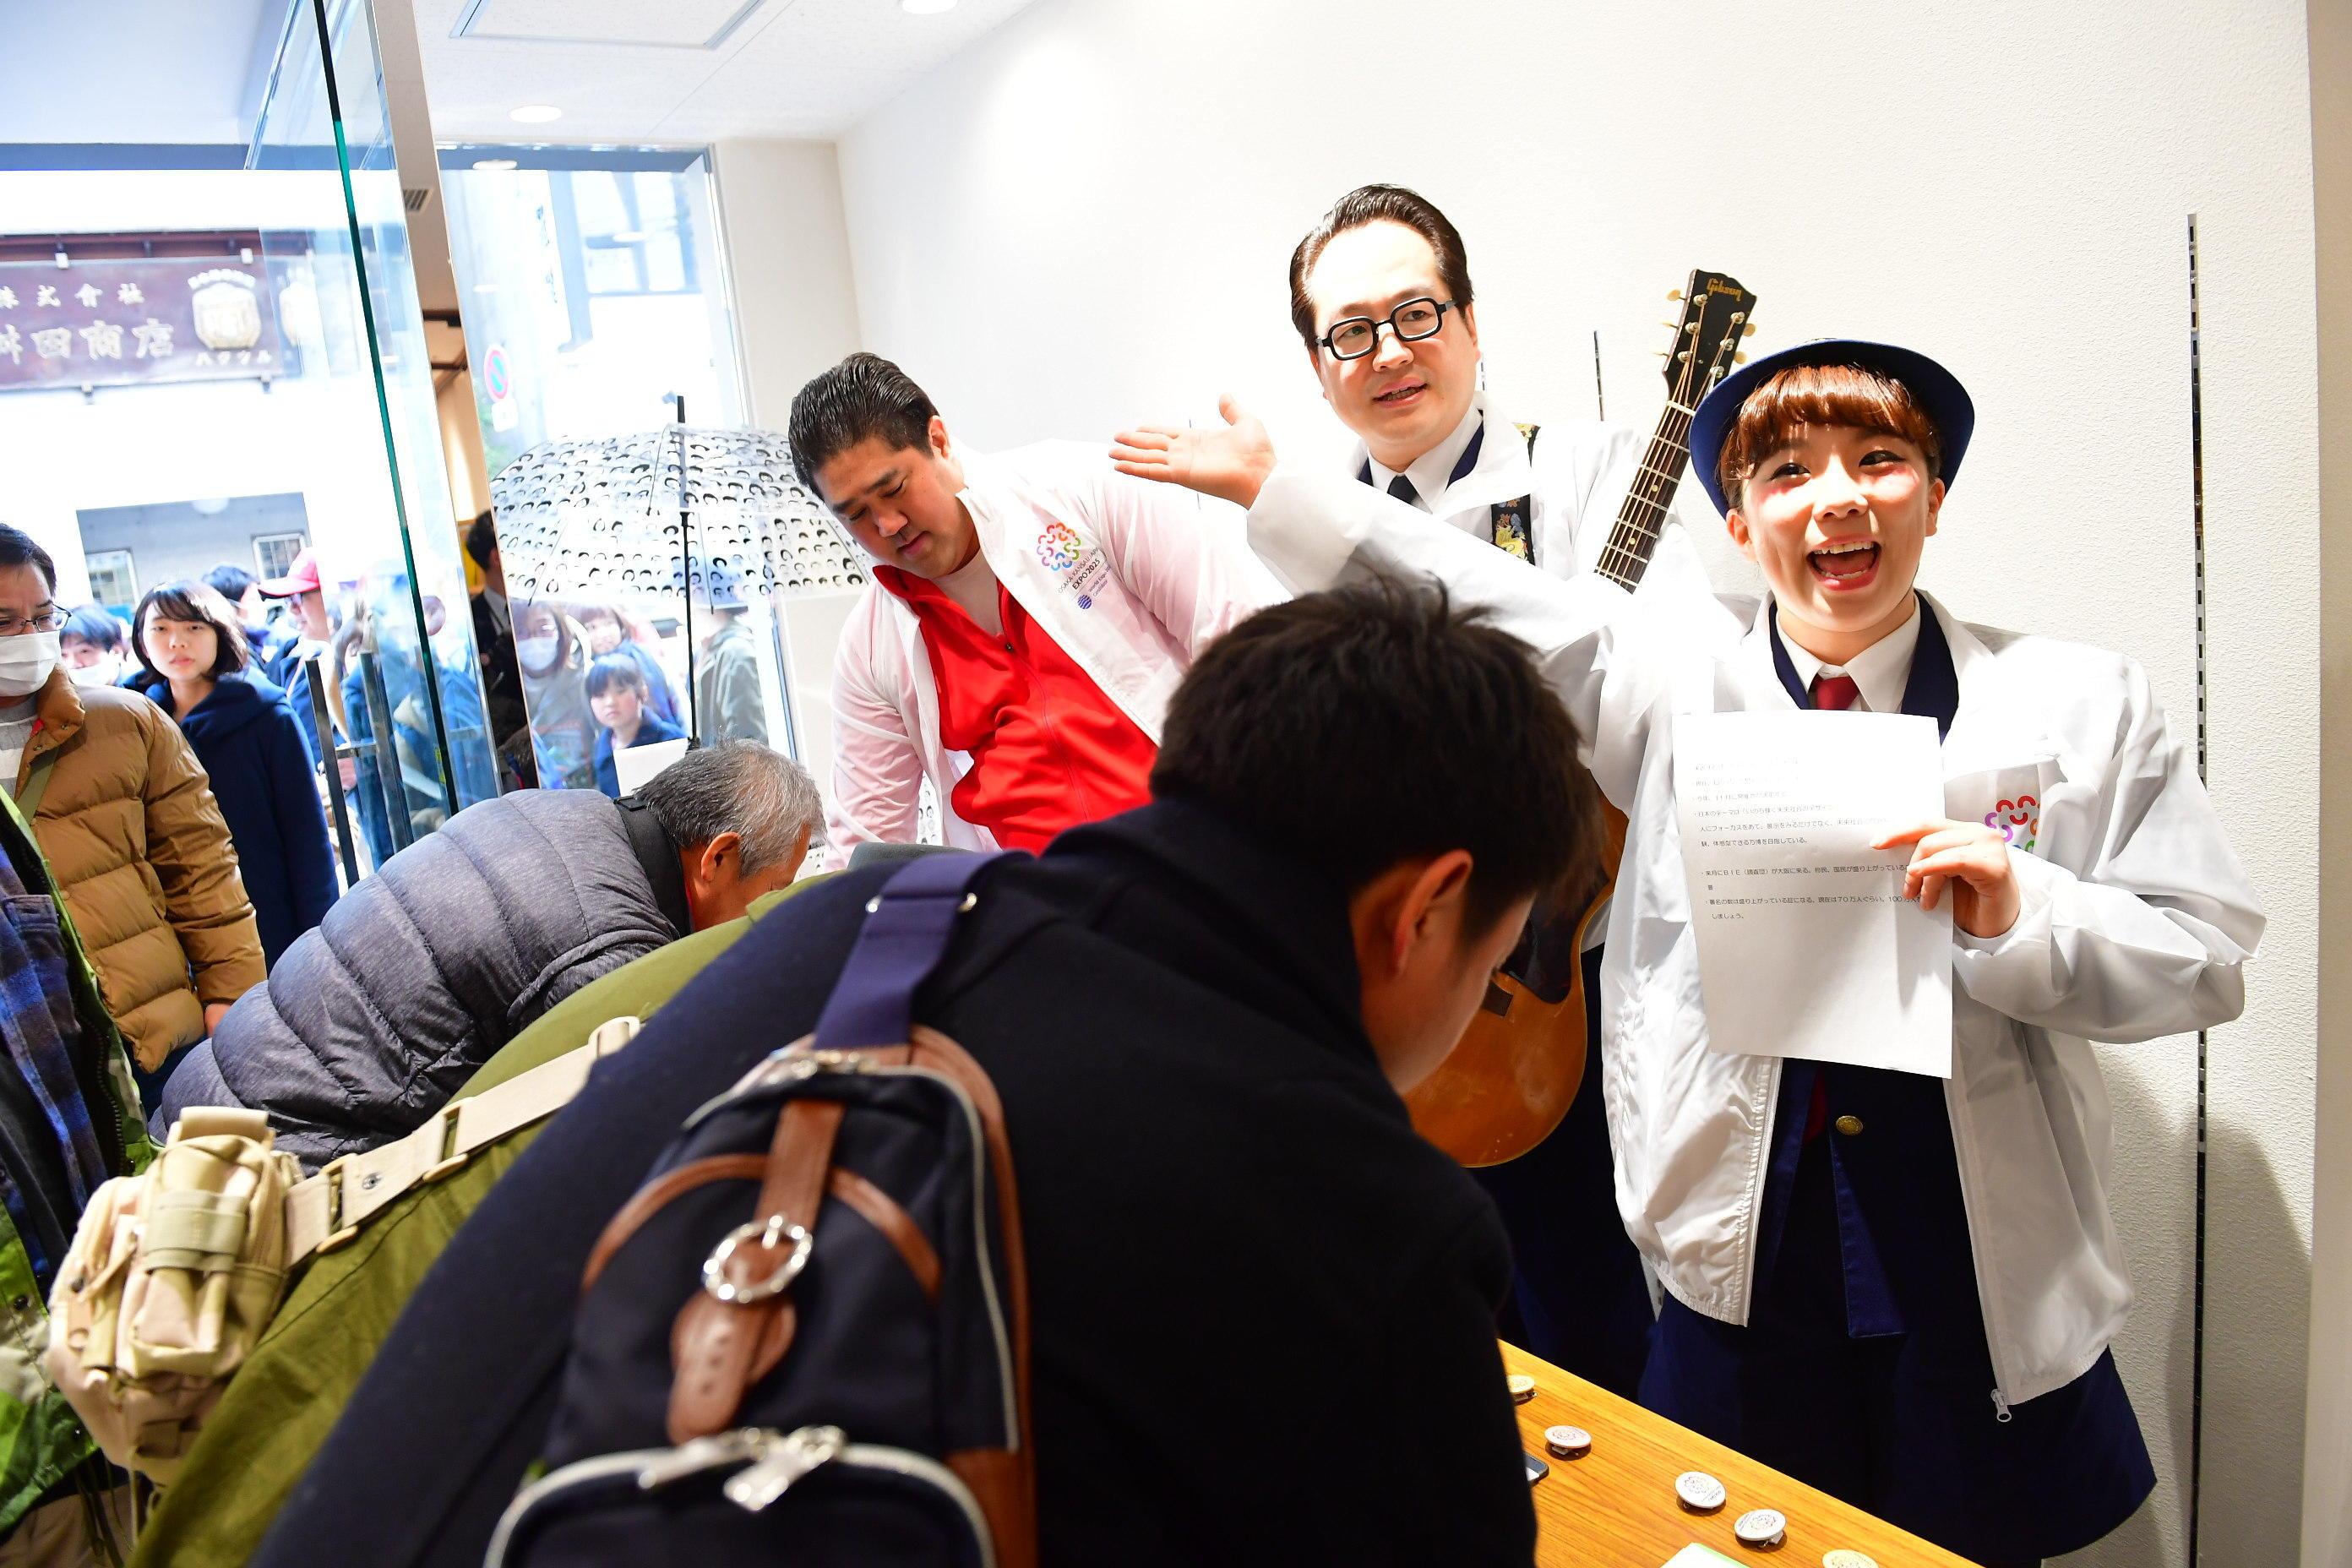 http://news.yoshimoto.co.jp/20180225120734-9f243d4e7ce8802cd4dcb001211bb9046a3a321c.jpg